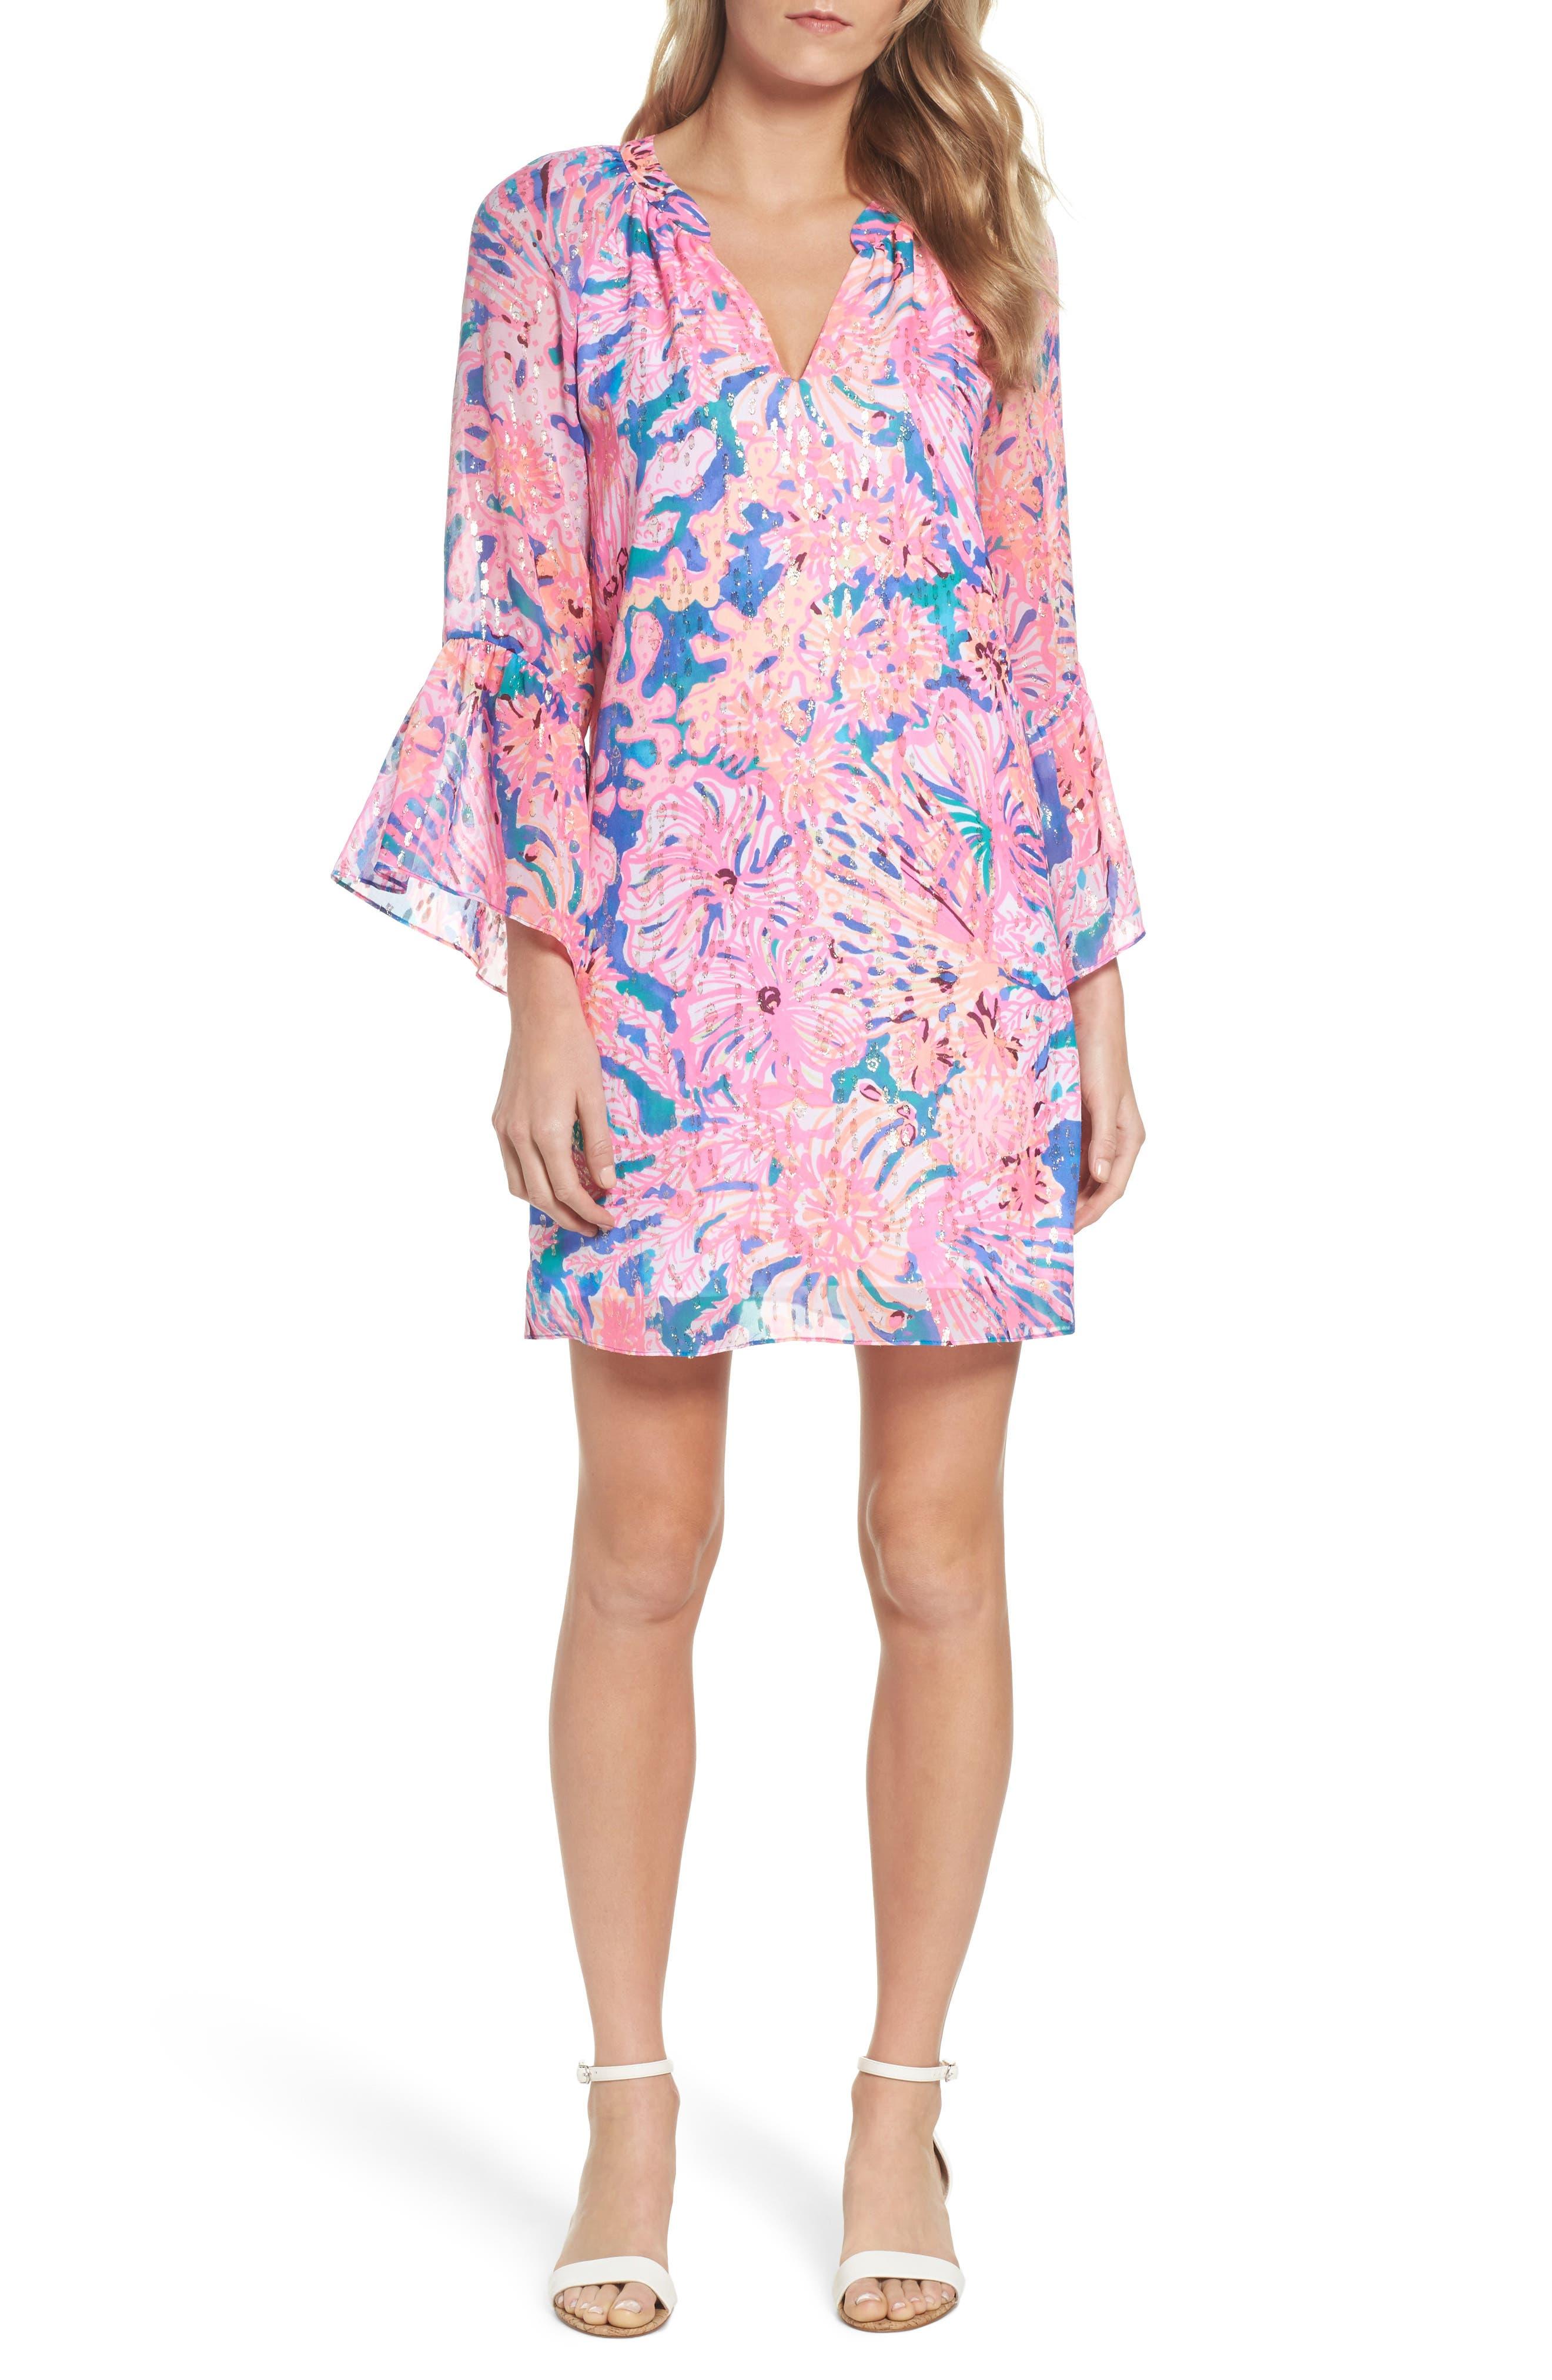 Main Image - Lilly Pulitzer® Matilda Tunic Dress